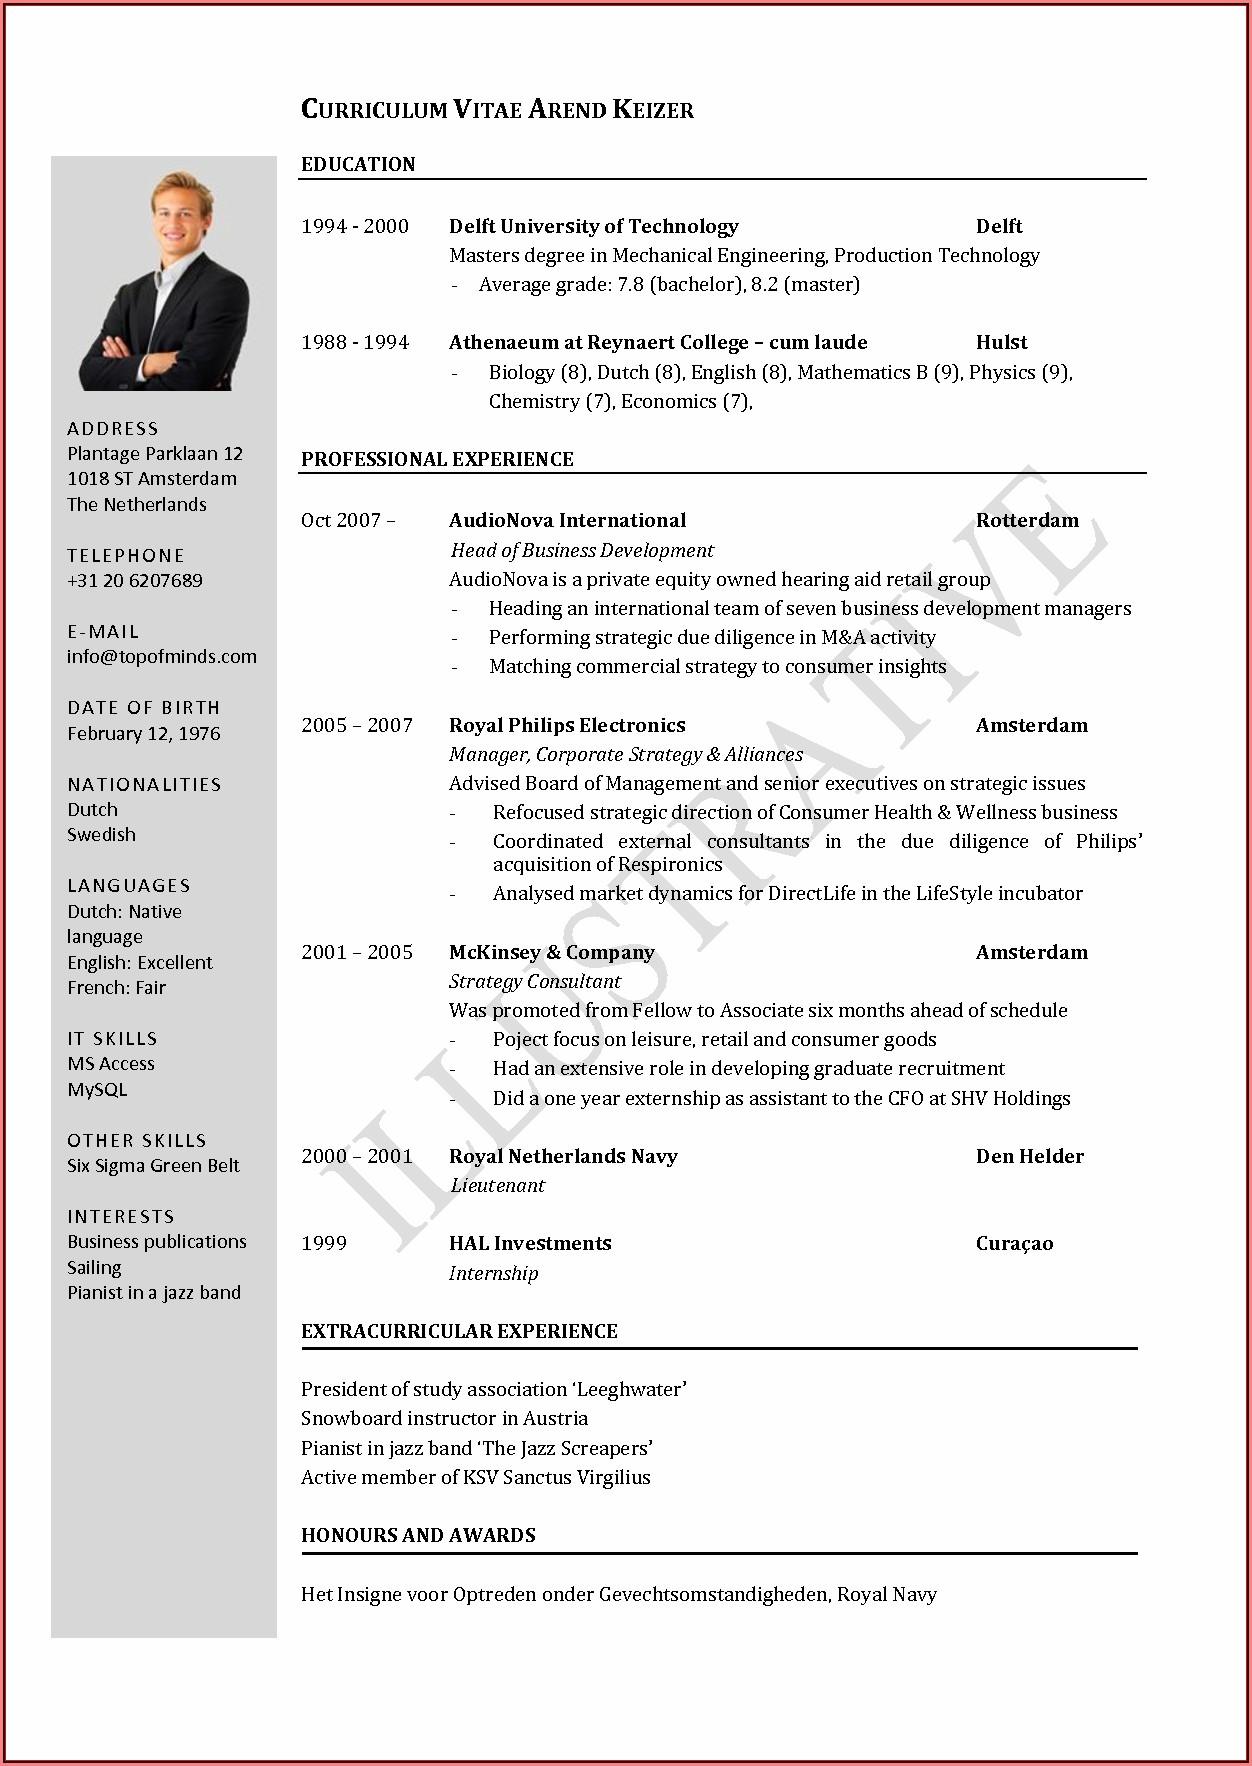 Curriculum Vitae (cv) Templates